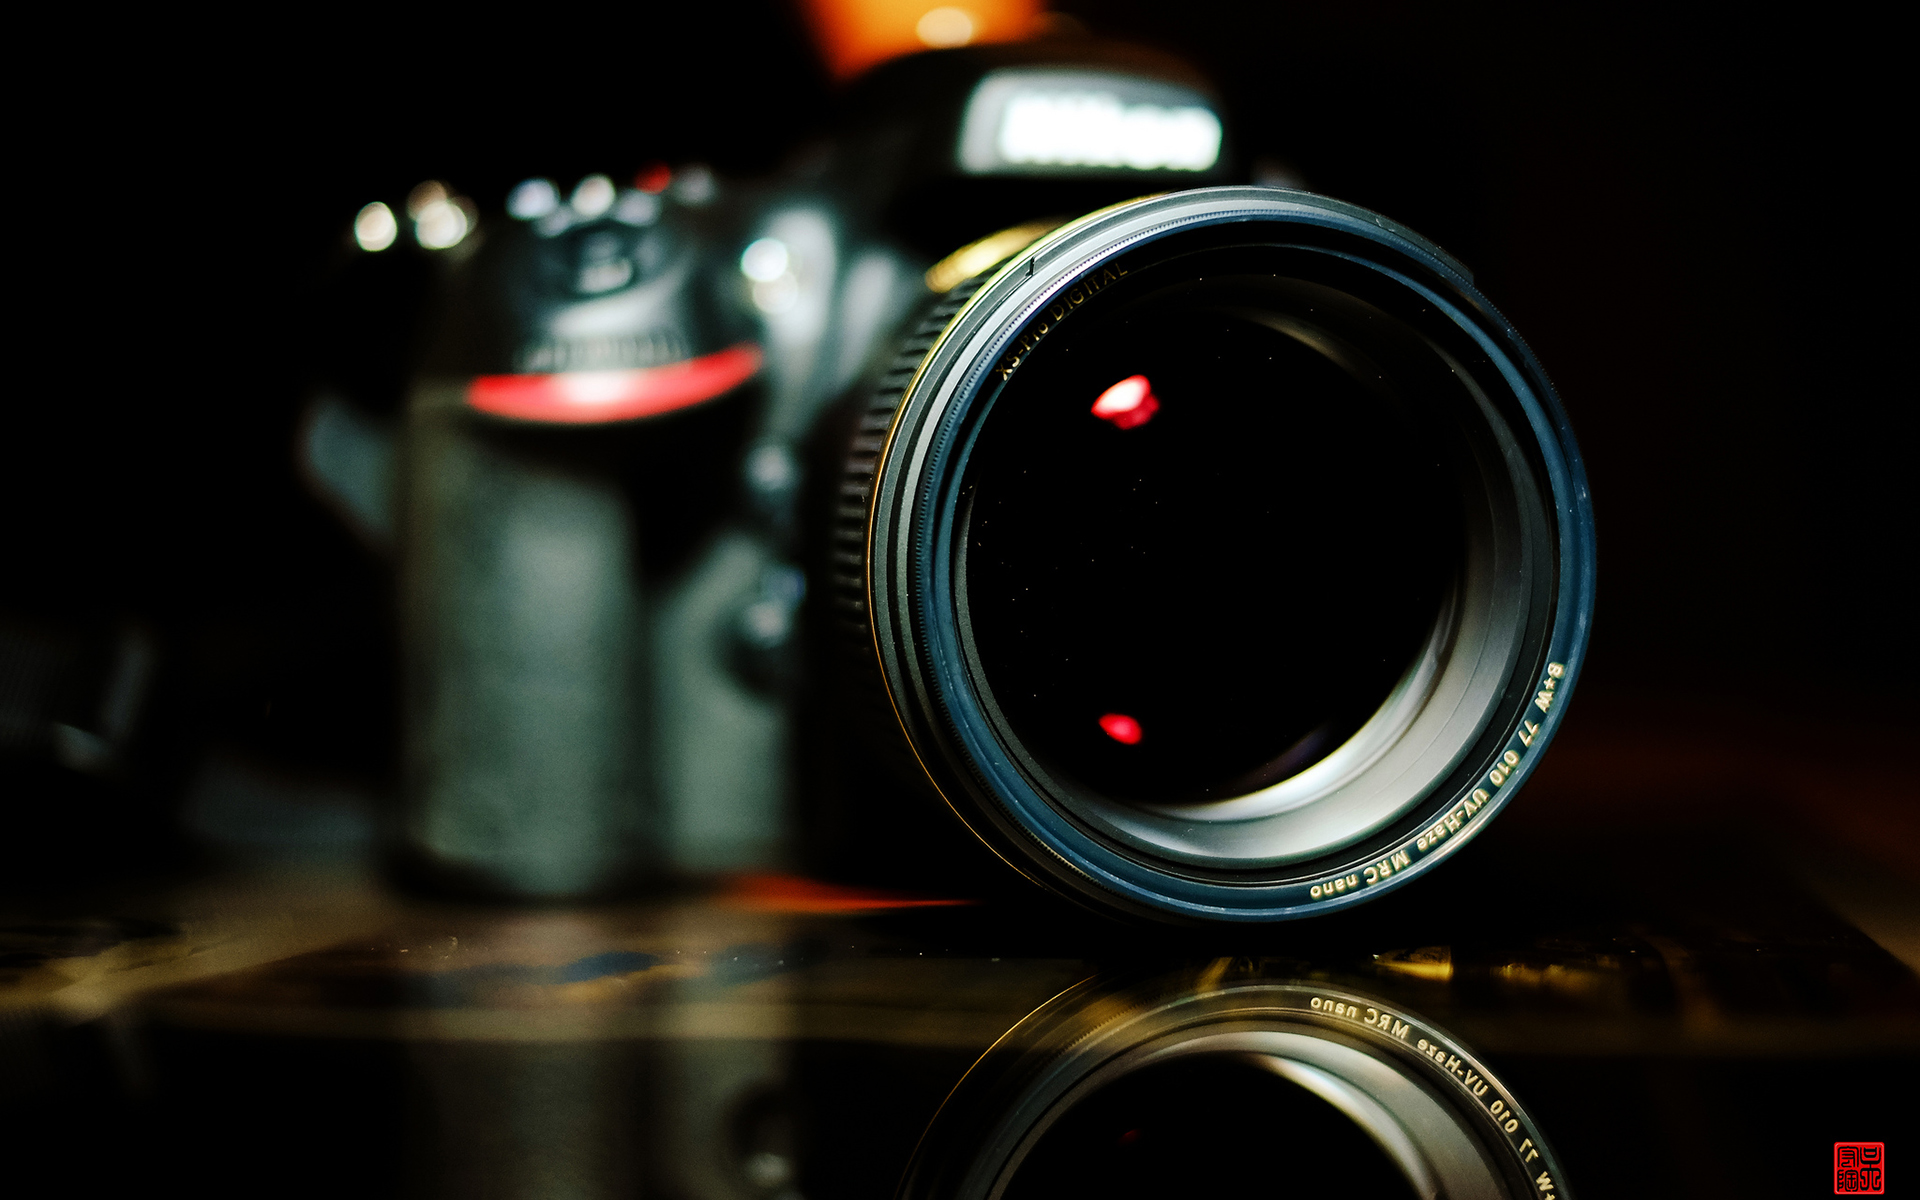 Camera Nikon Dslr Lens Macro Wallpaper 1920x1200 133027